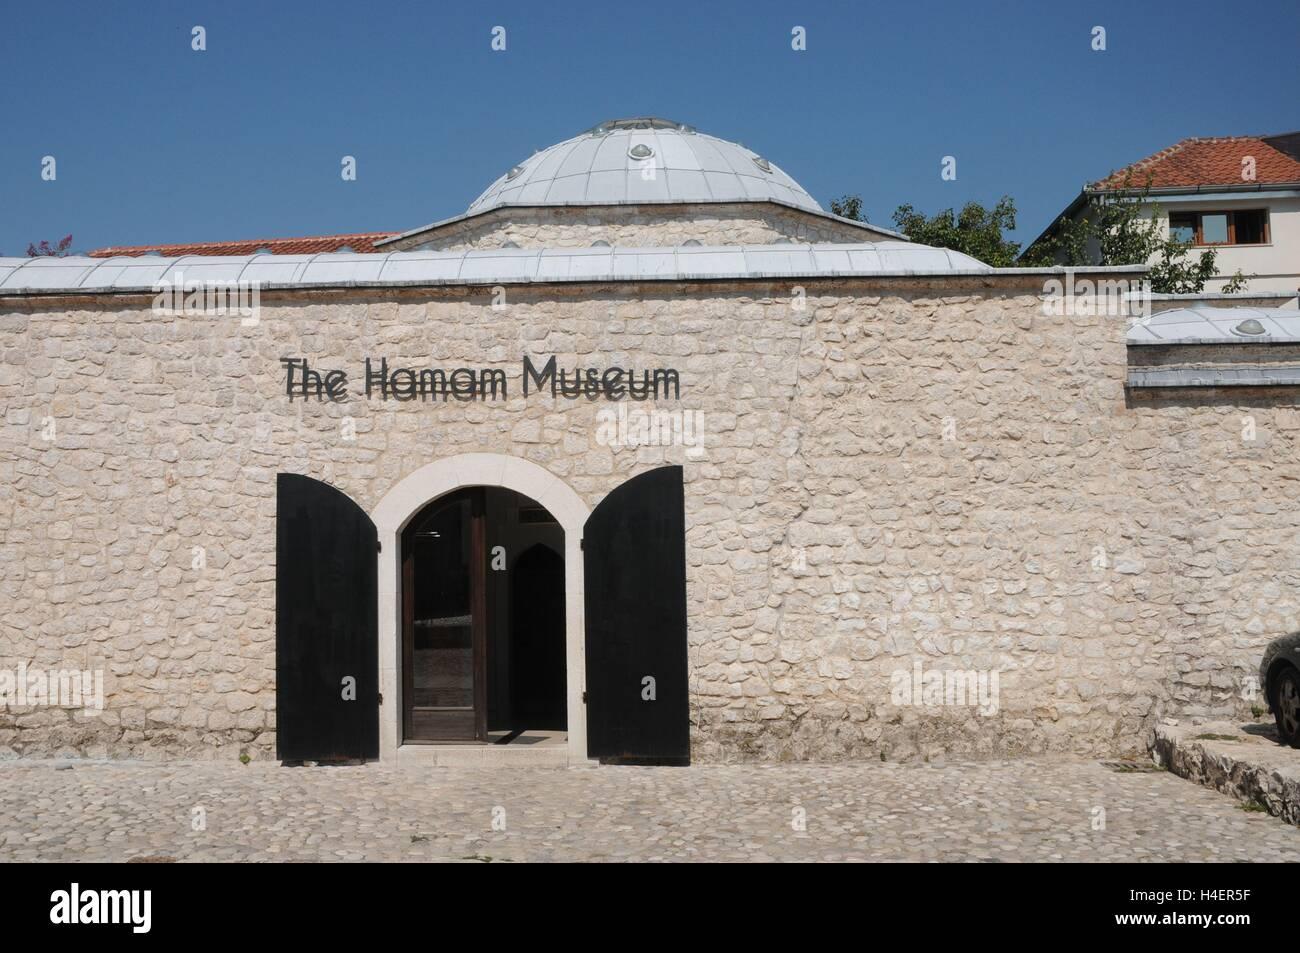 The Hamam Museum, Mostar, Bosnia Herzegovina - Stock Image